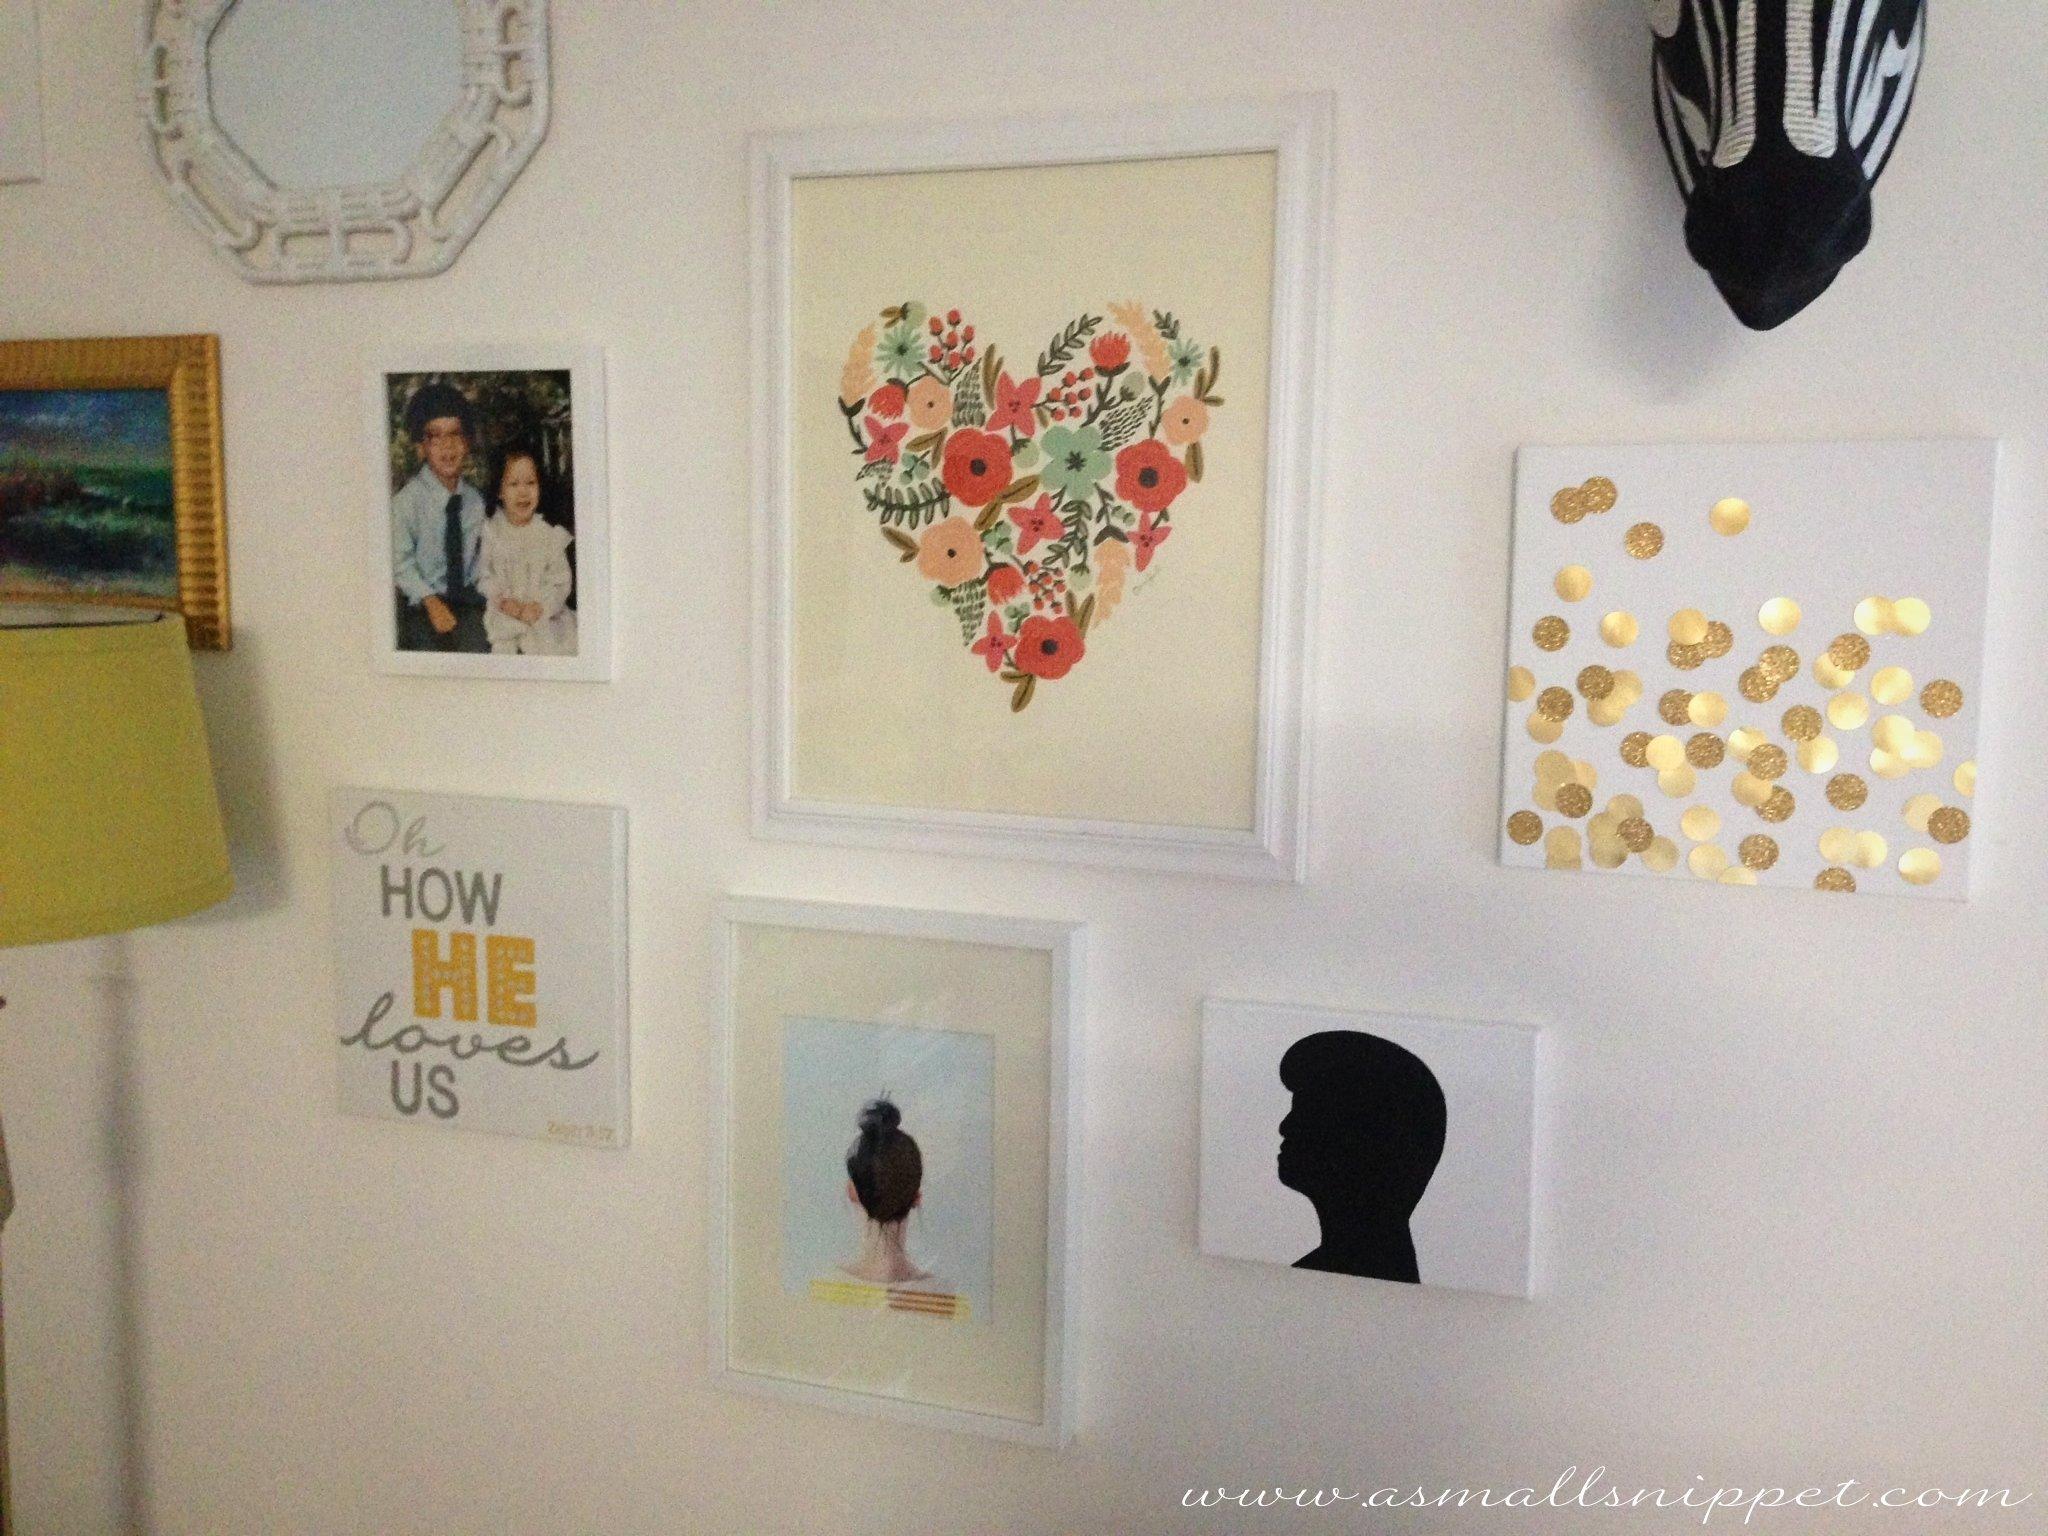 10 Stylish Easy Diy Canvas Painting Ideas easy diy canvas painting ideas home art decor 20714 2020